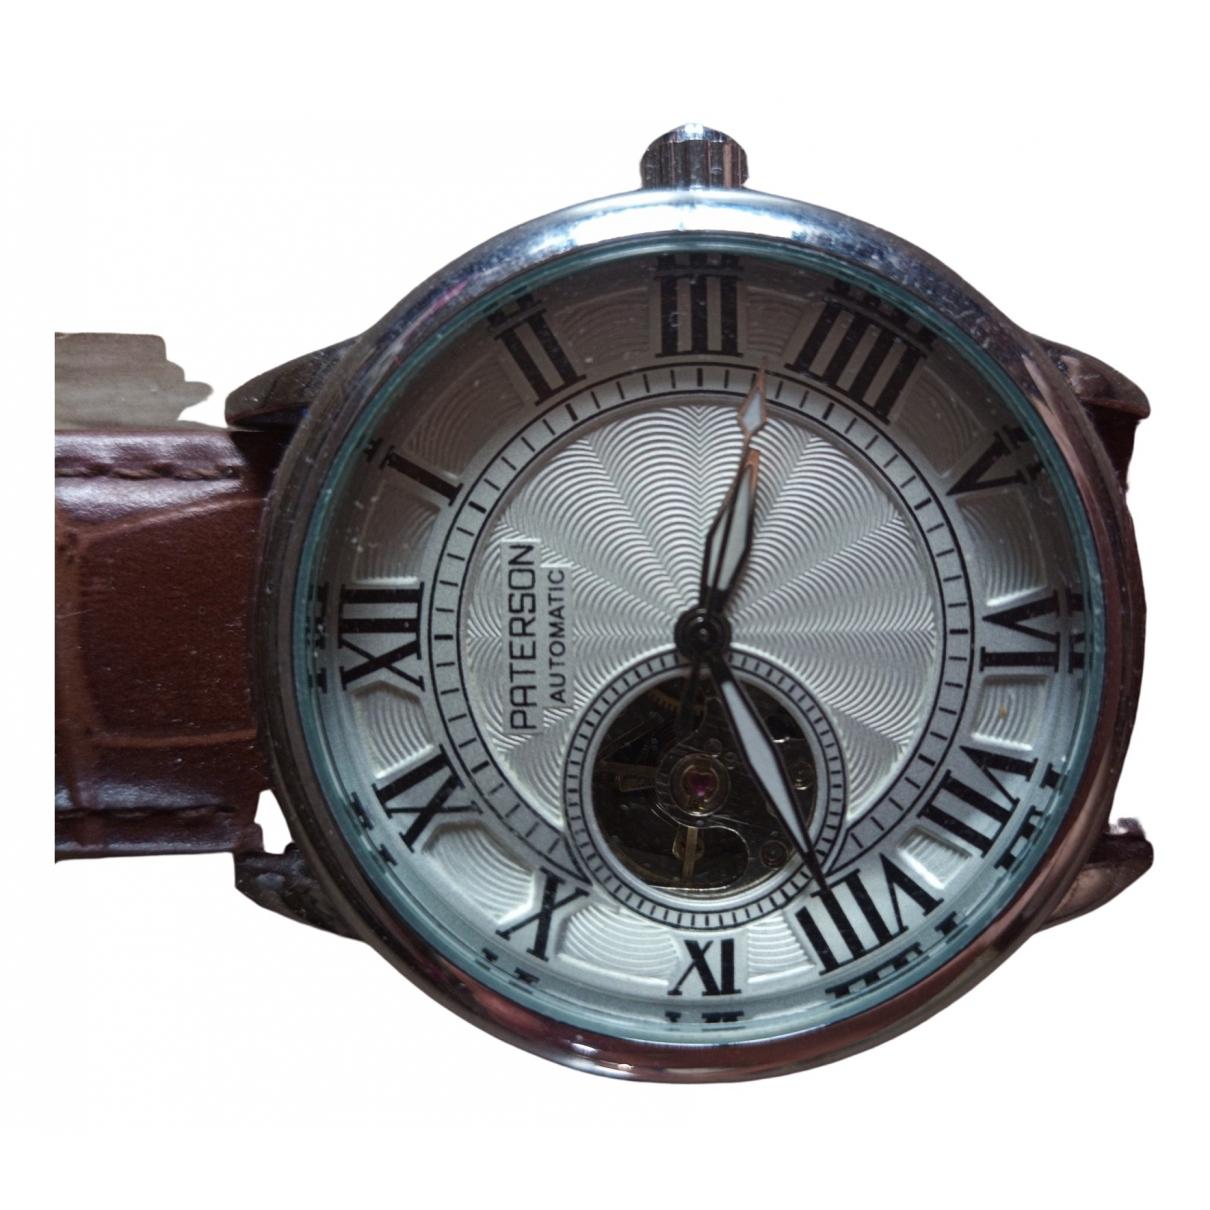 Paterson \N White Steel watch for Men \N